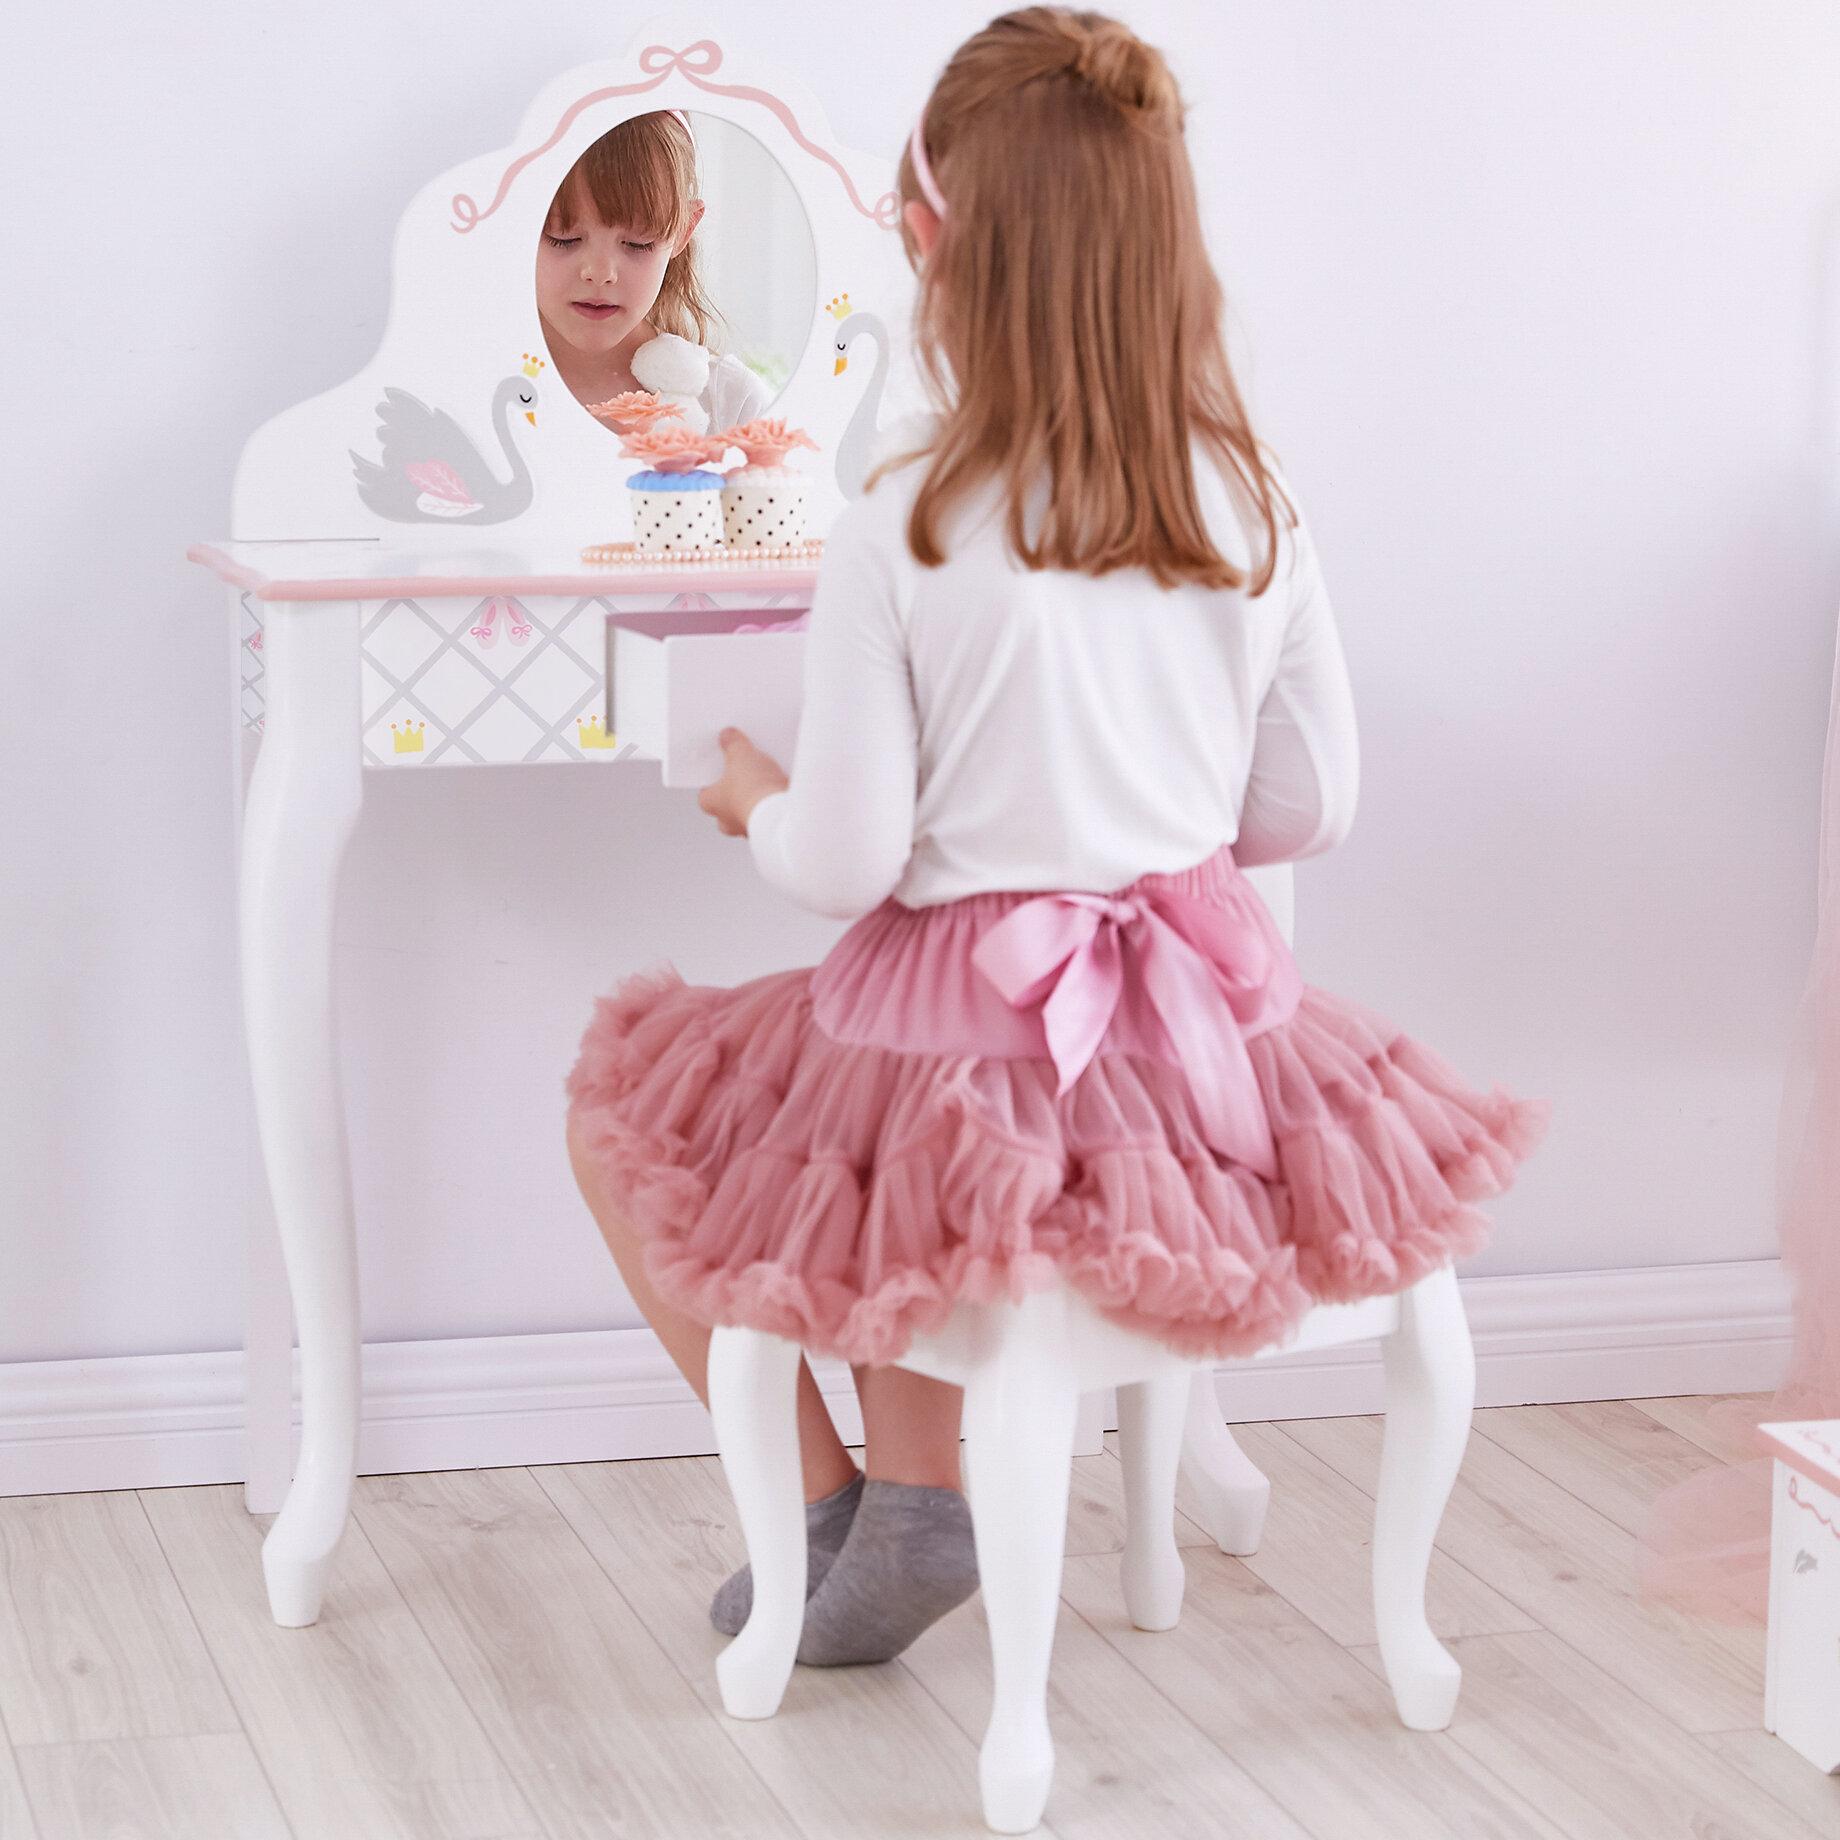 Mack Milo Aceves Dressing Table Set With Mirror Reviews Wayfair Co Uk